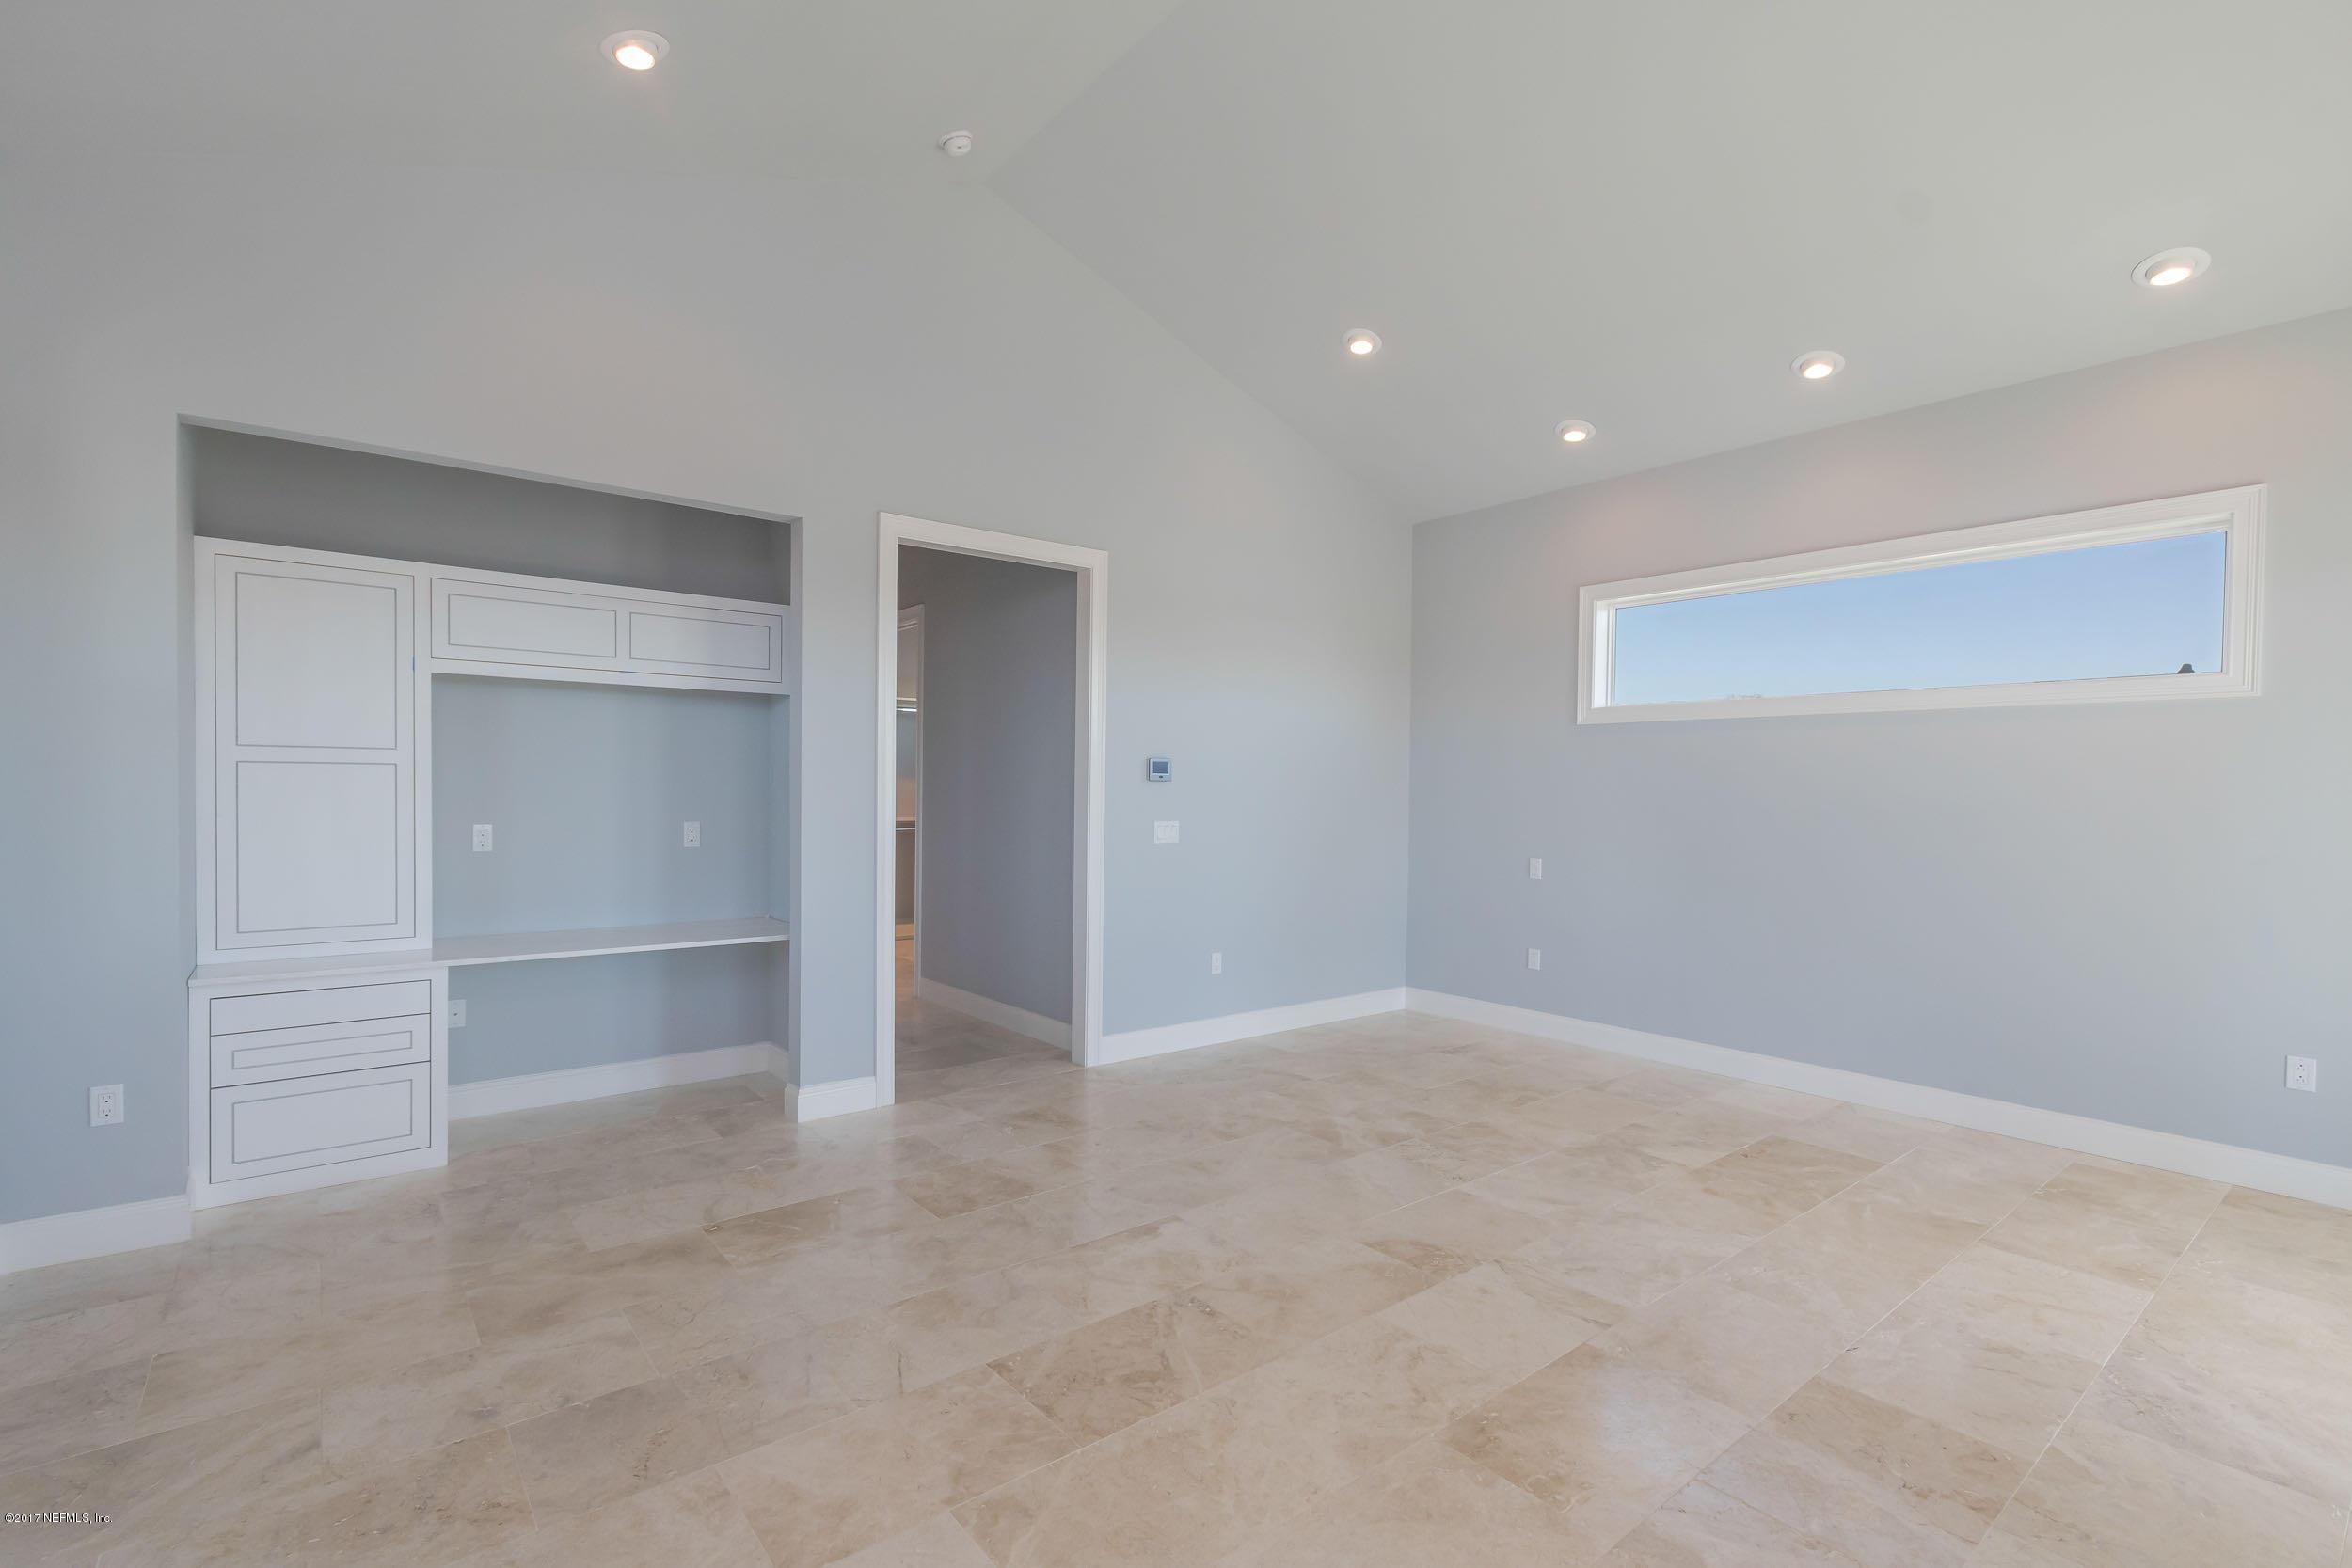 328 HARBOR VILLAGE, PALM COAST, FLORIDA 32137, 4 Bedrooms Bedrooms, ,3 BathroomsBathrooms,Residential - single family,For sale,HARBOR VILLAGE,912728